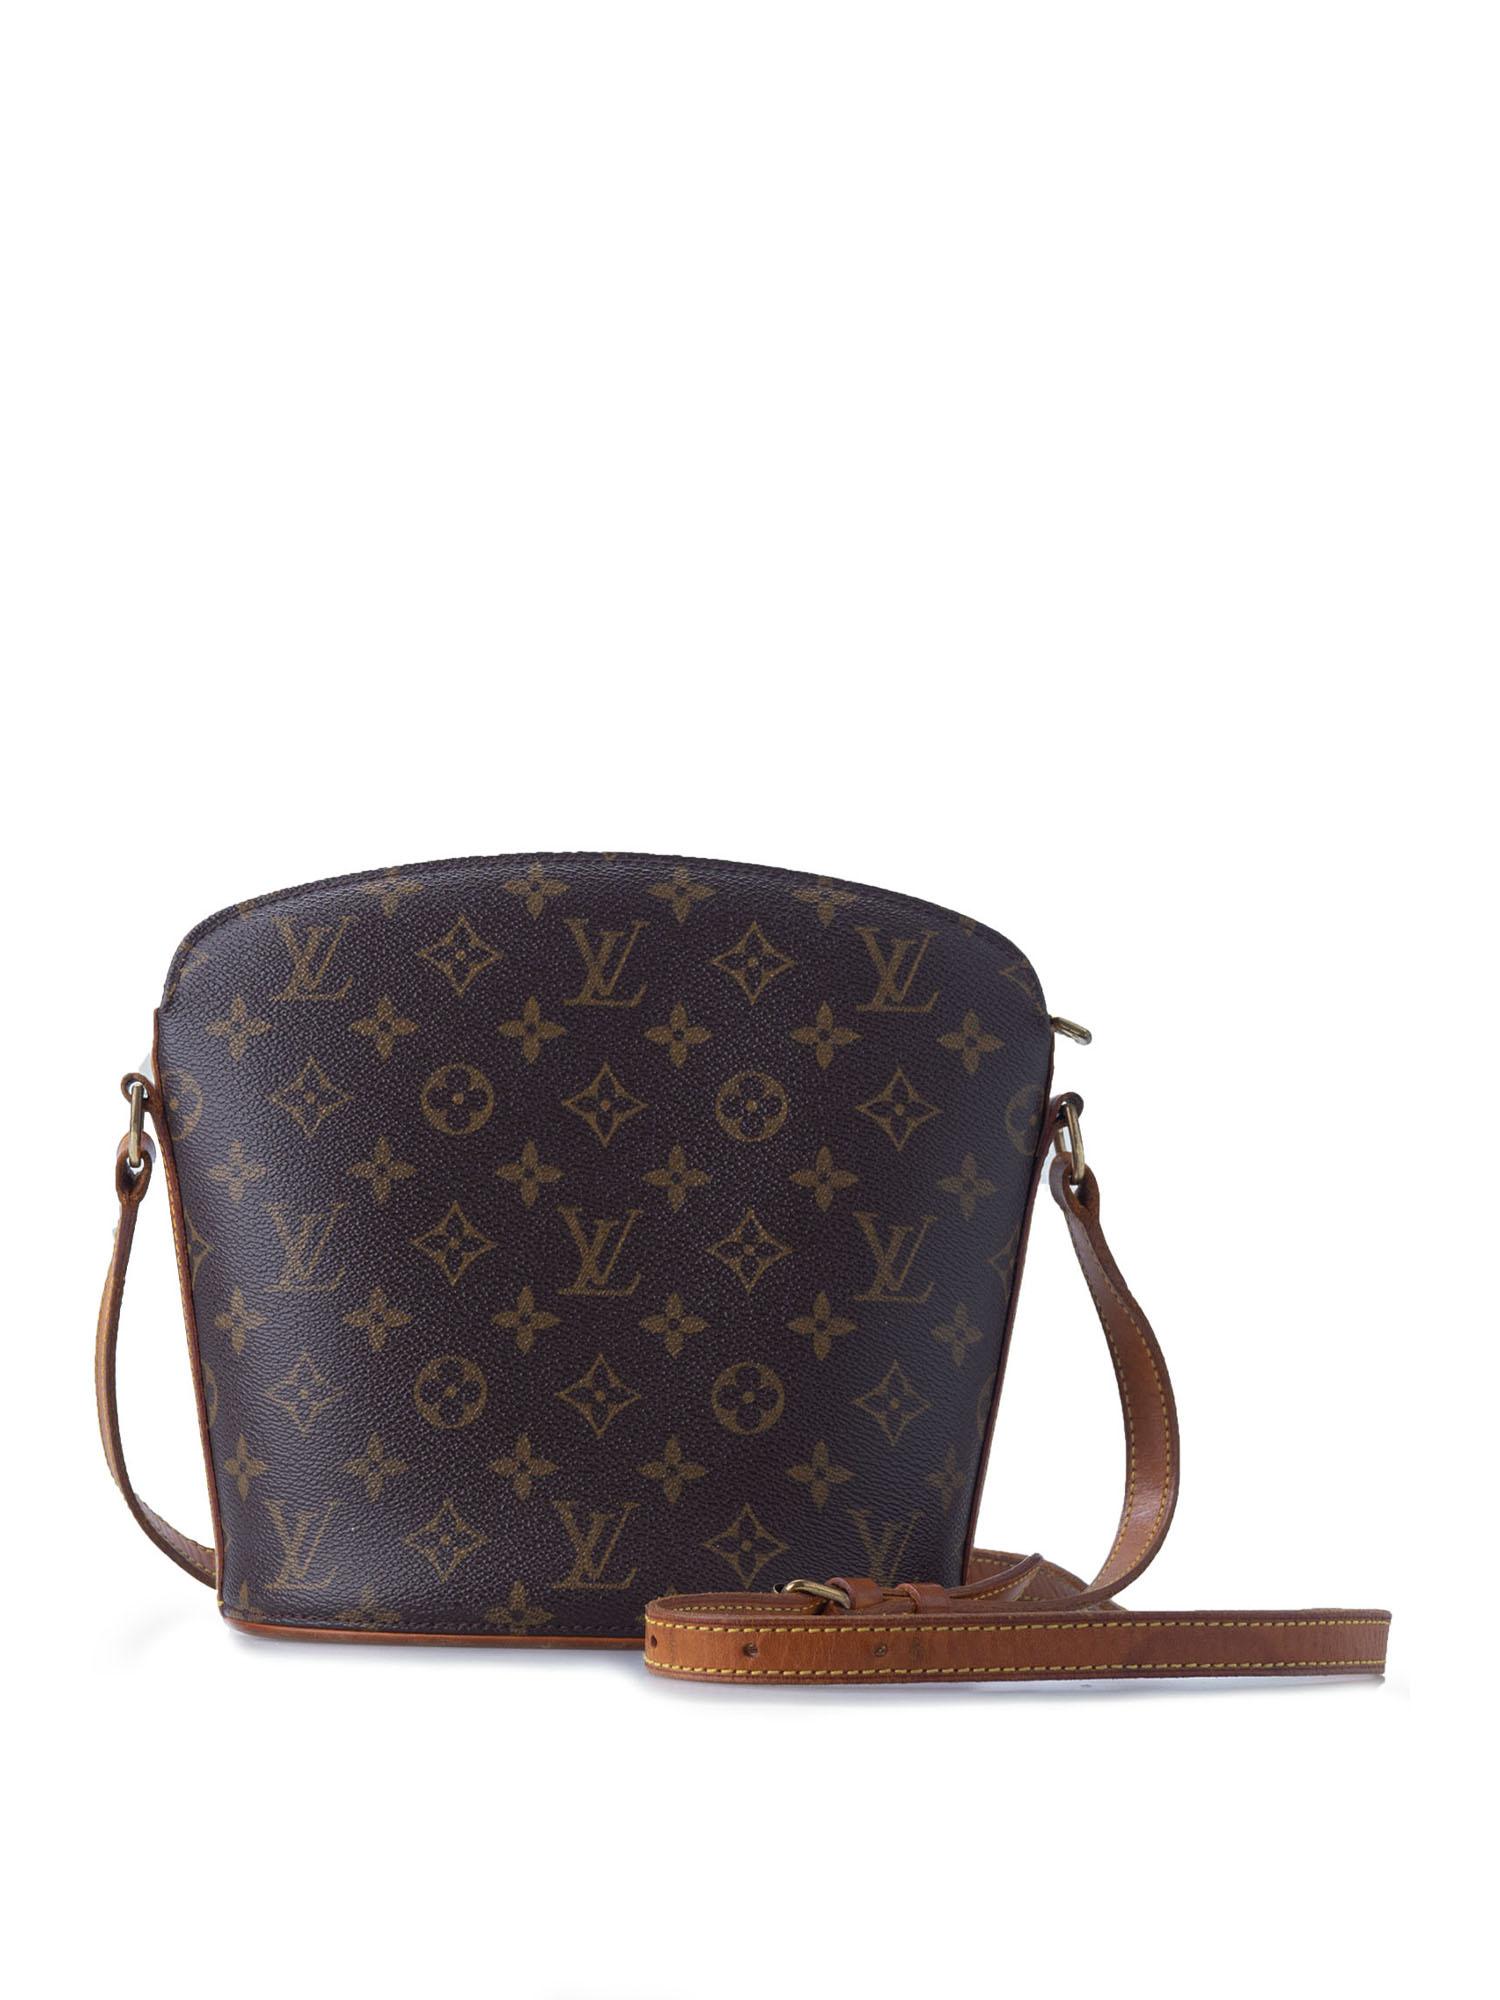 Louis Vuitton Vintage Drouot Monogram Crossbody BagArtboard 1